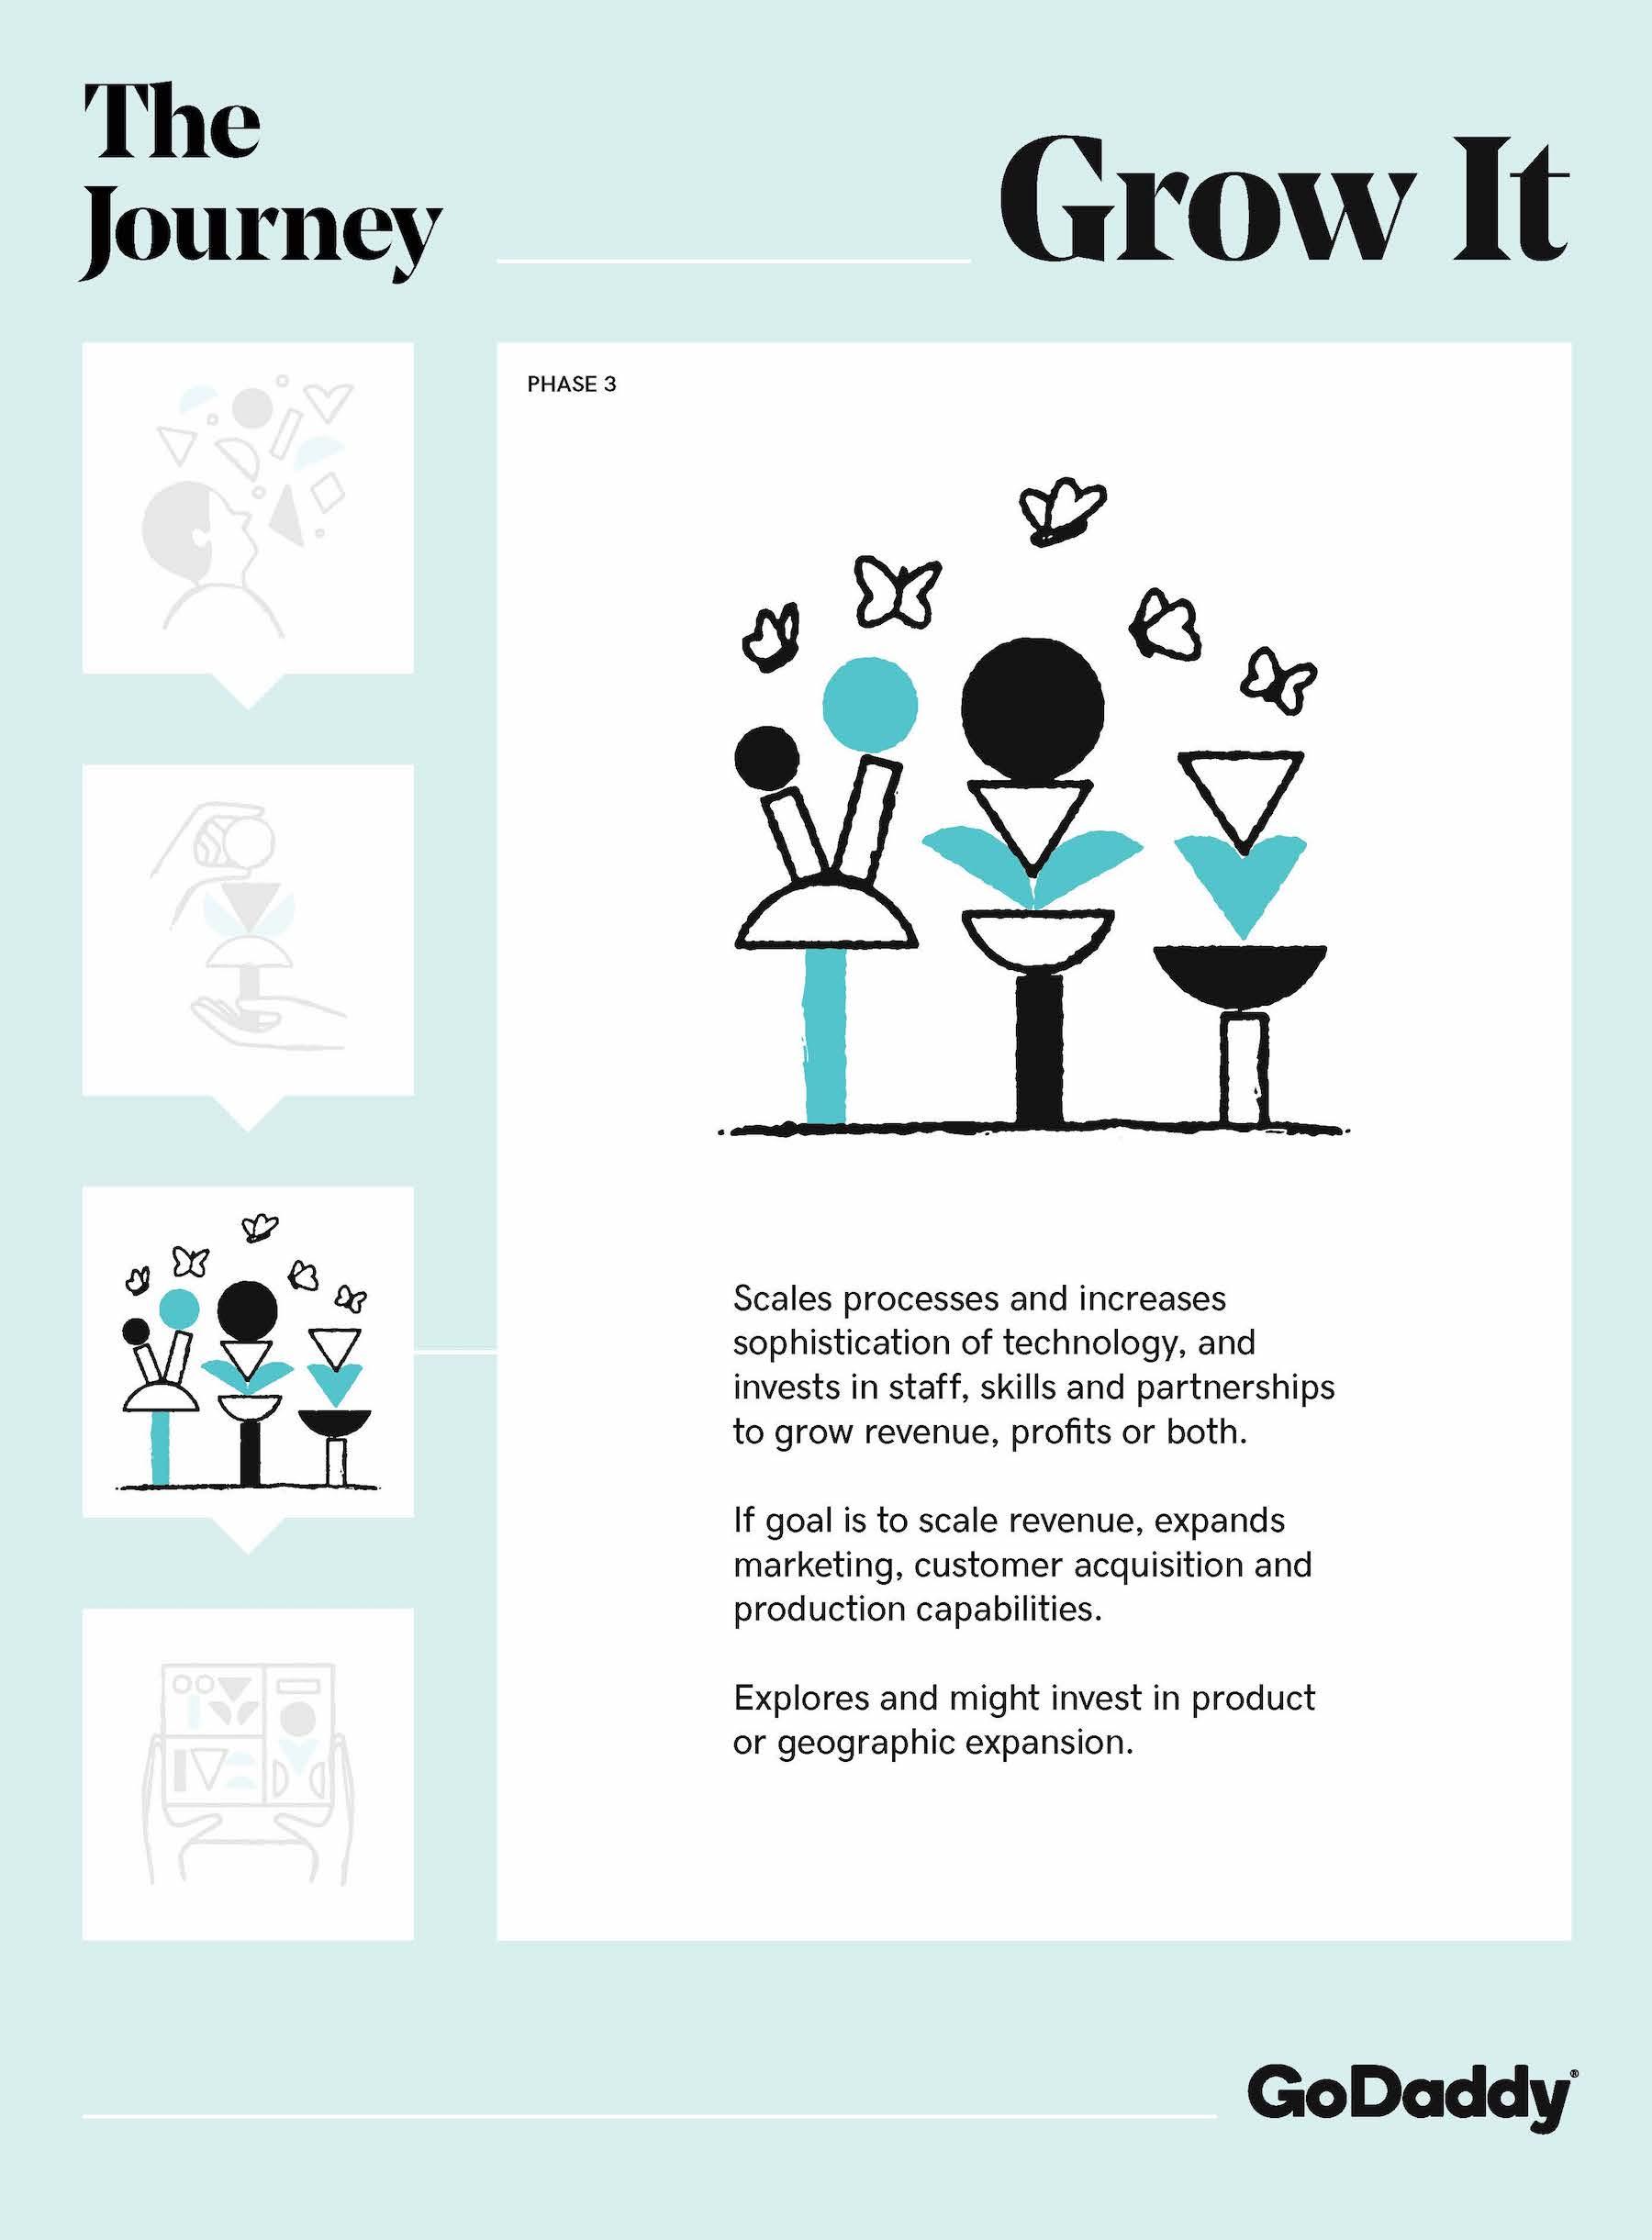 GoDaddy Entrepreneur Journey Grow It Stage Graphic